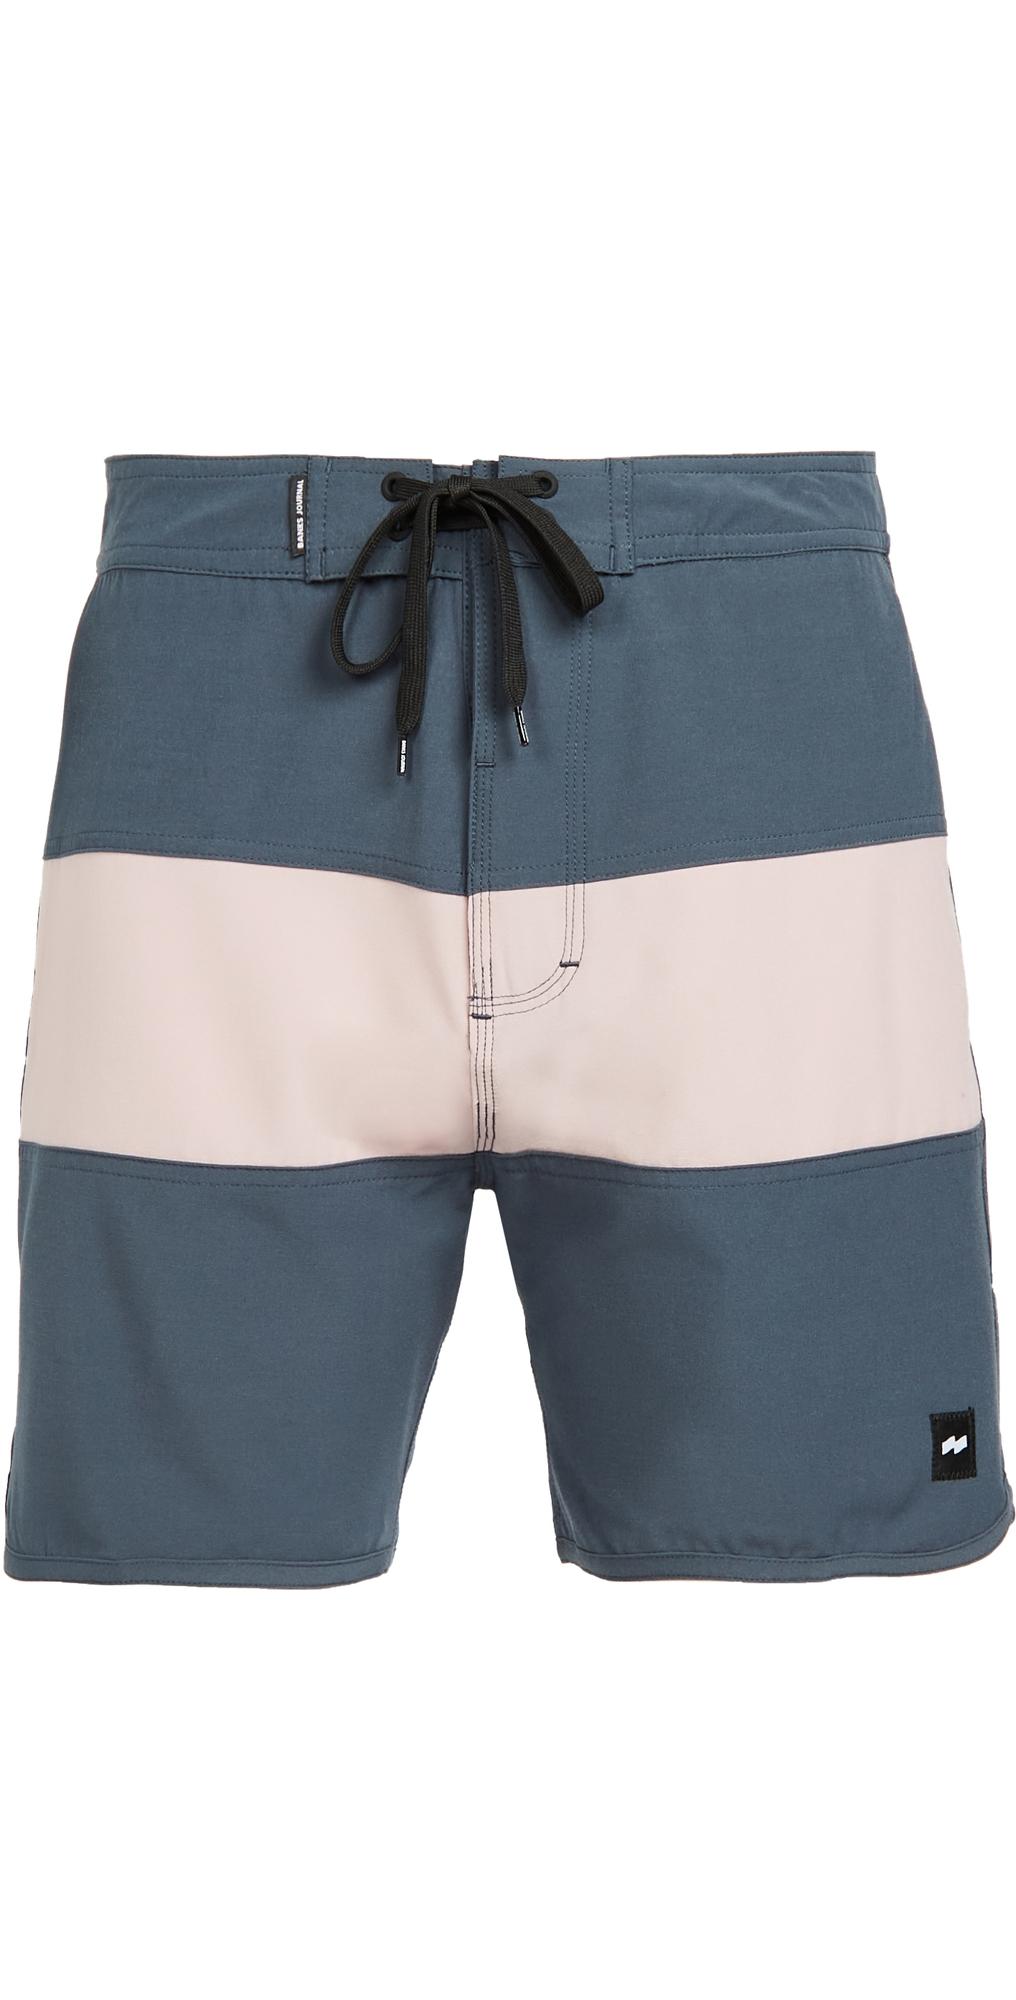 Validate Shorts